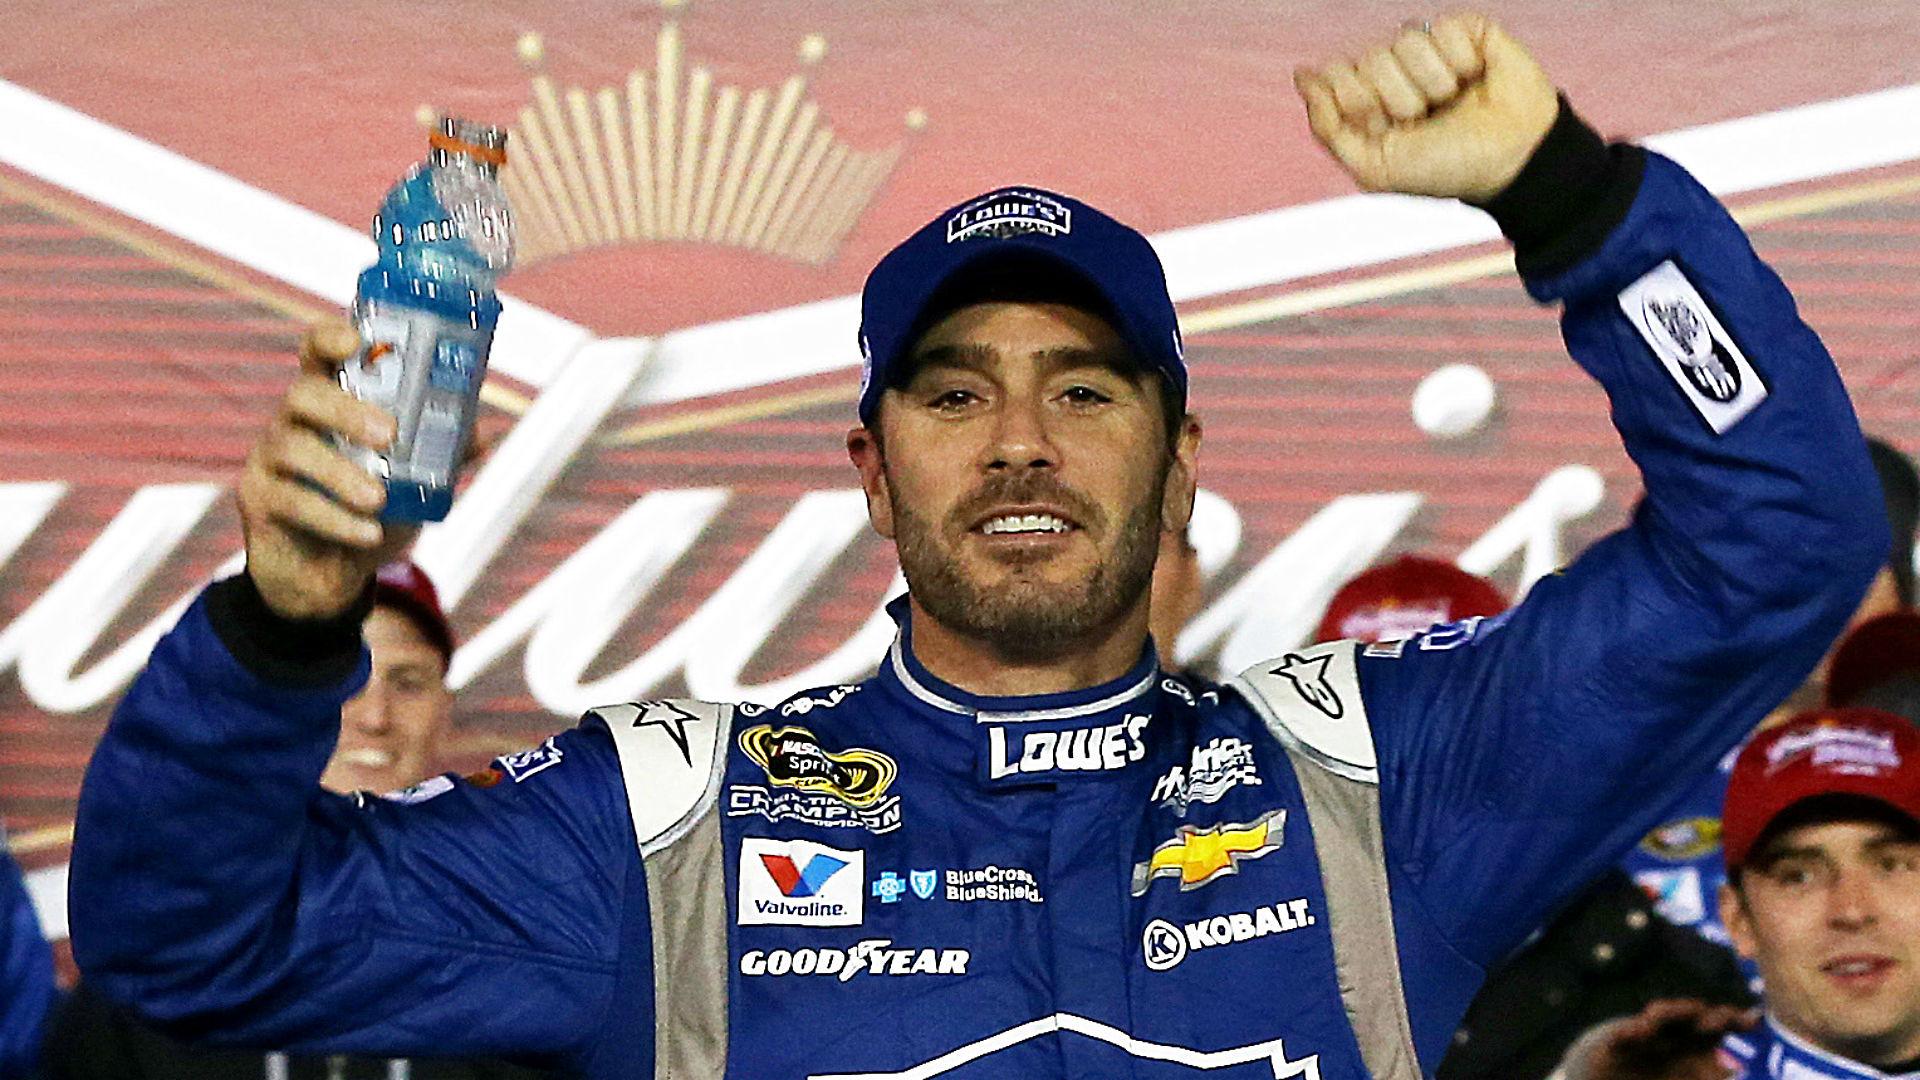 Daytona 500 driver ratings – Johnson rises, Keselowski falls